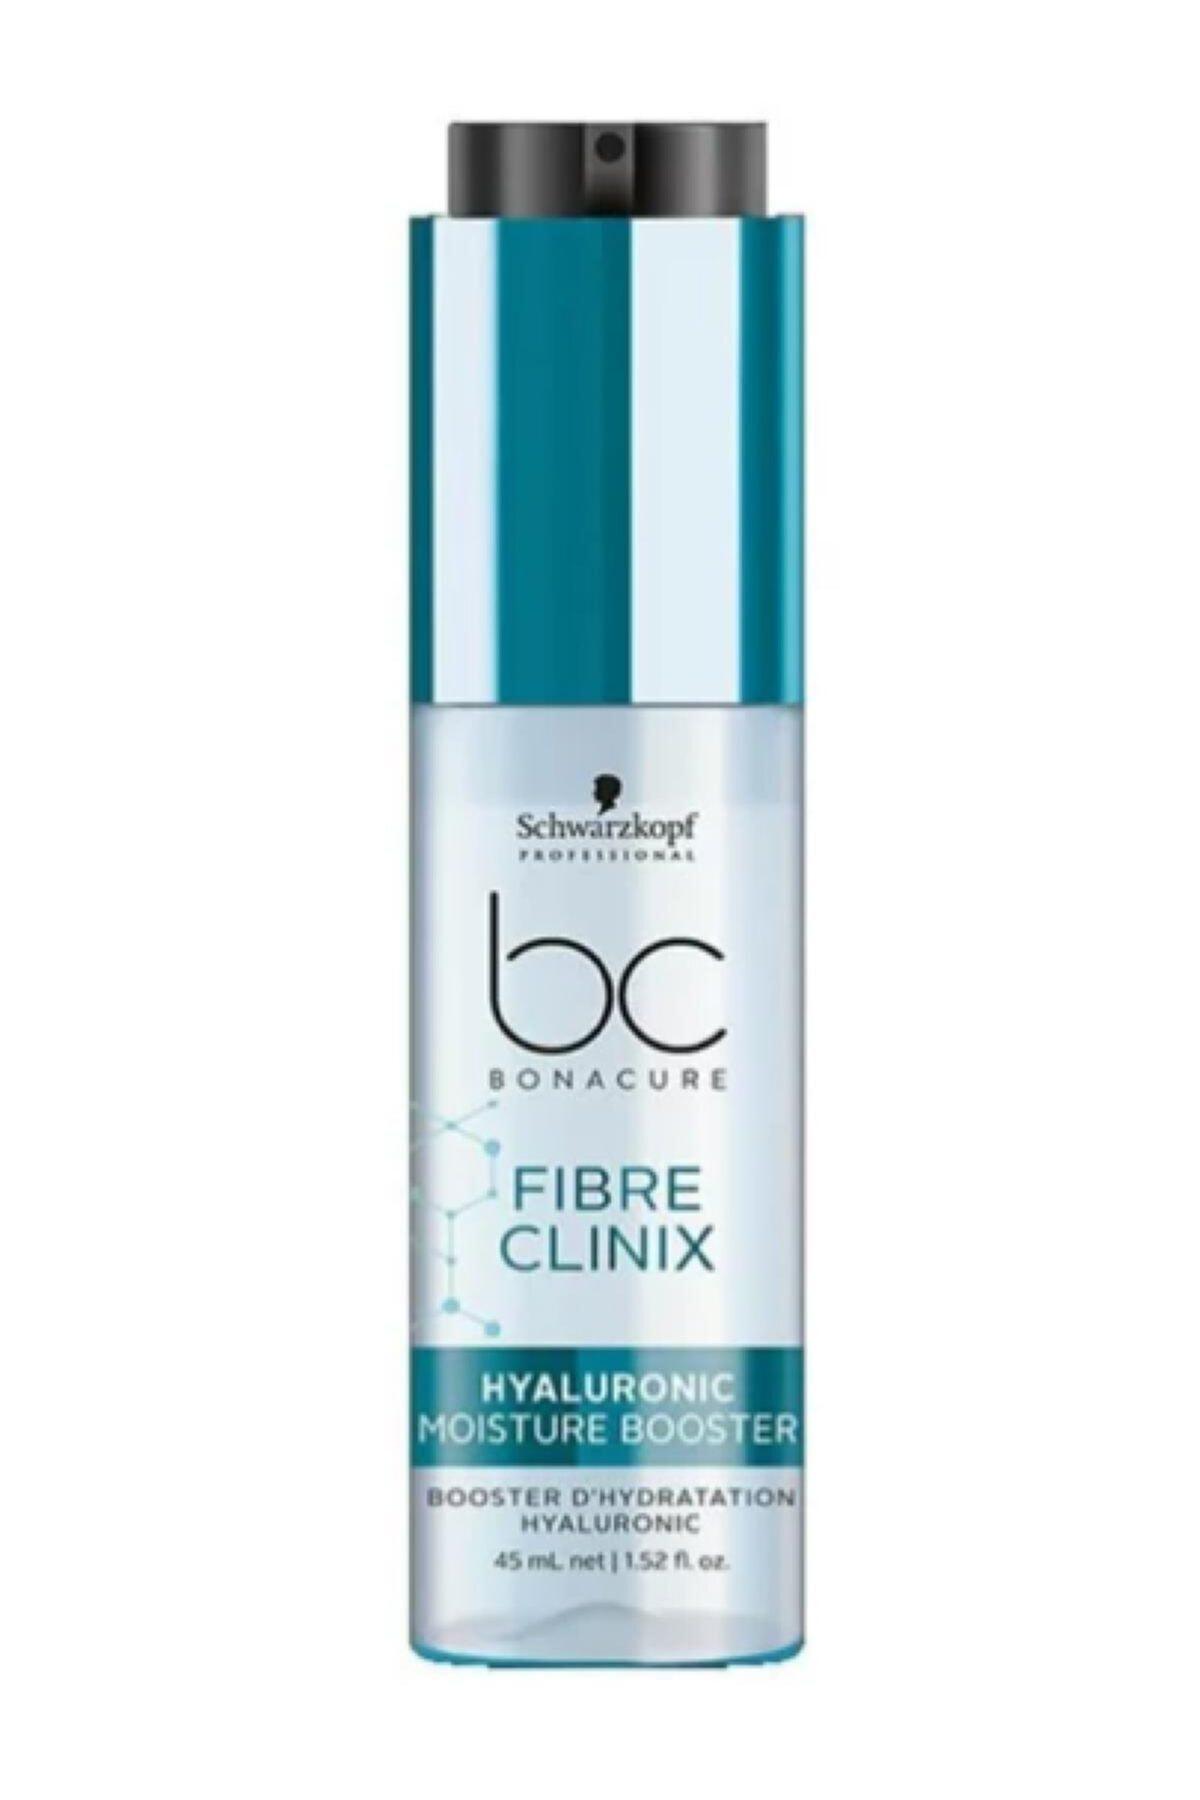 Bonacure Bc Bonacure Fibre Clinix Hyaluronic Nem Yükleme Booster 45 ml KO4045787449419 1